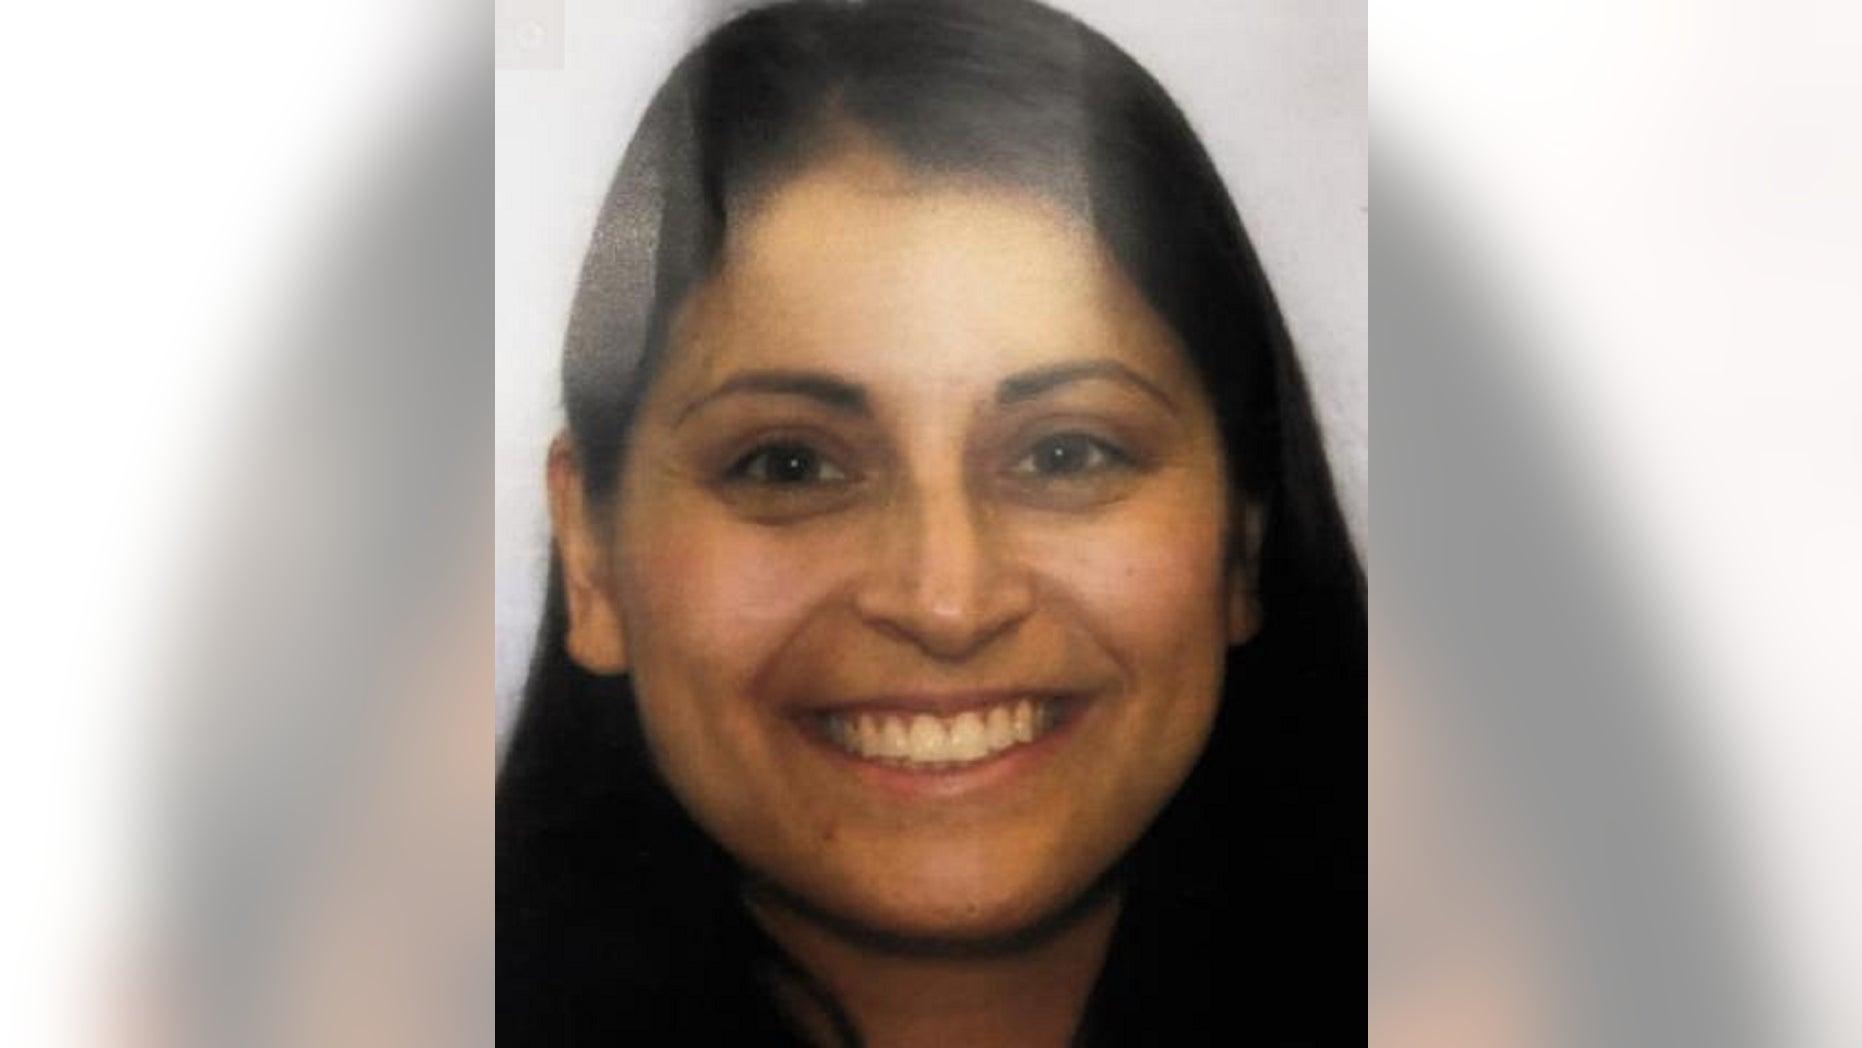 Prep school teacher, 28, had 'sex in the park' with 16-year